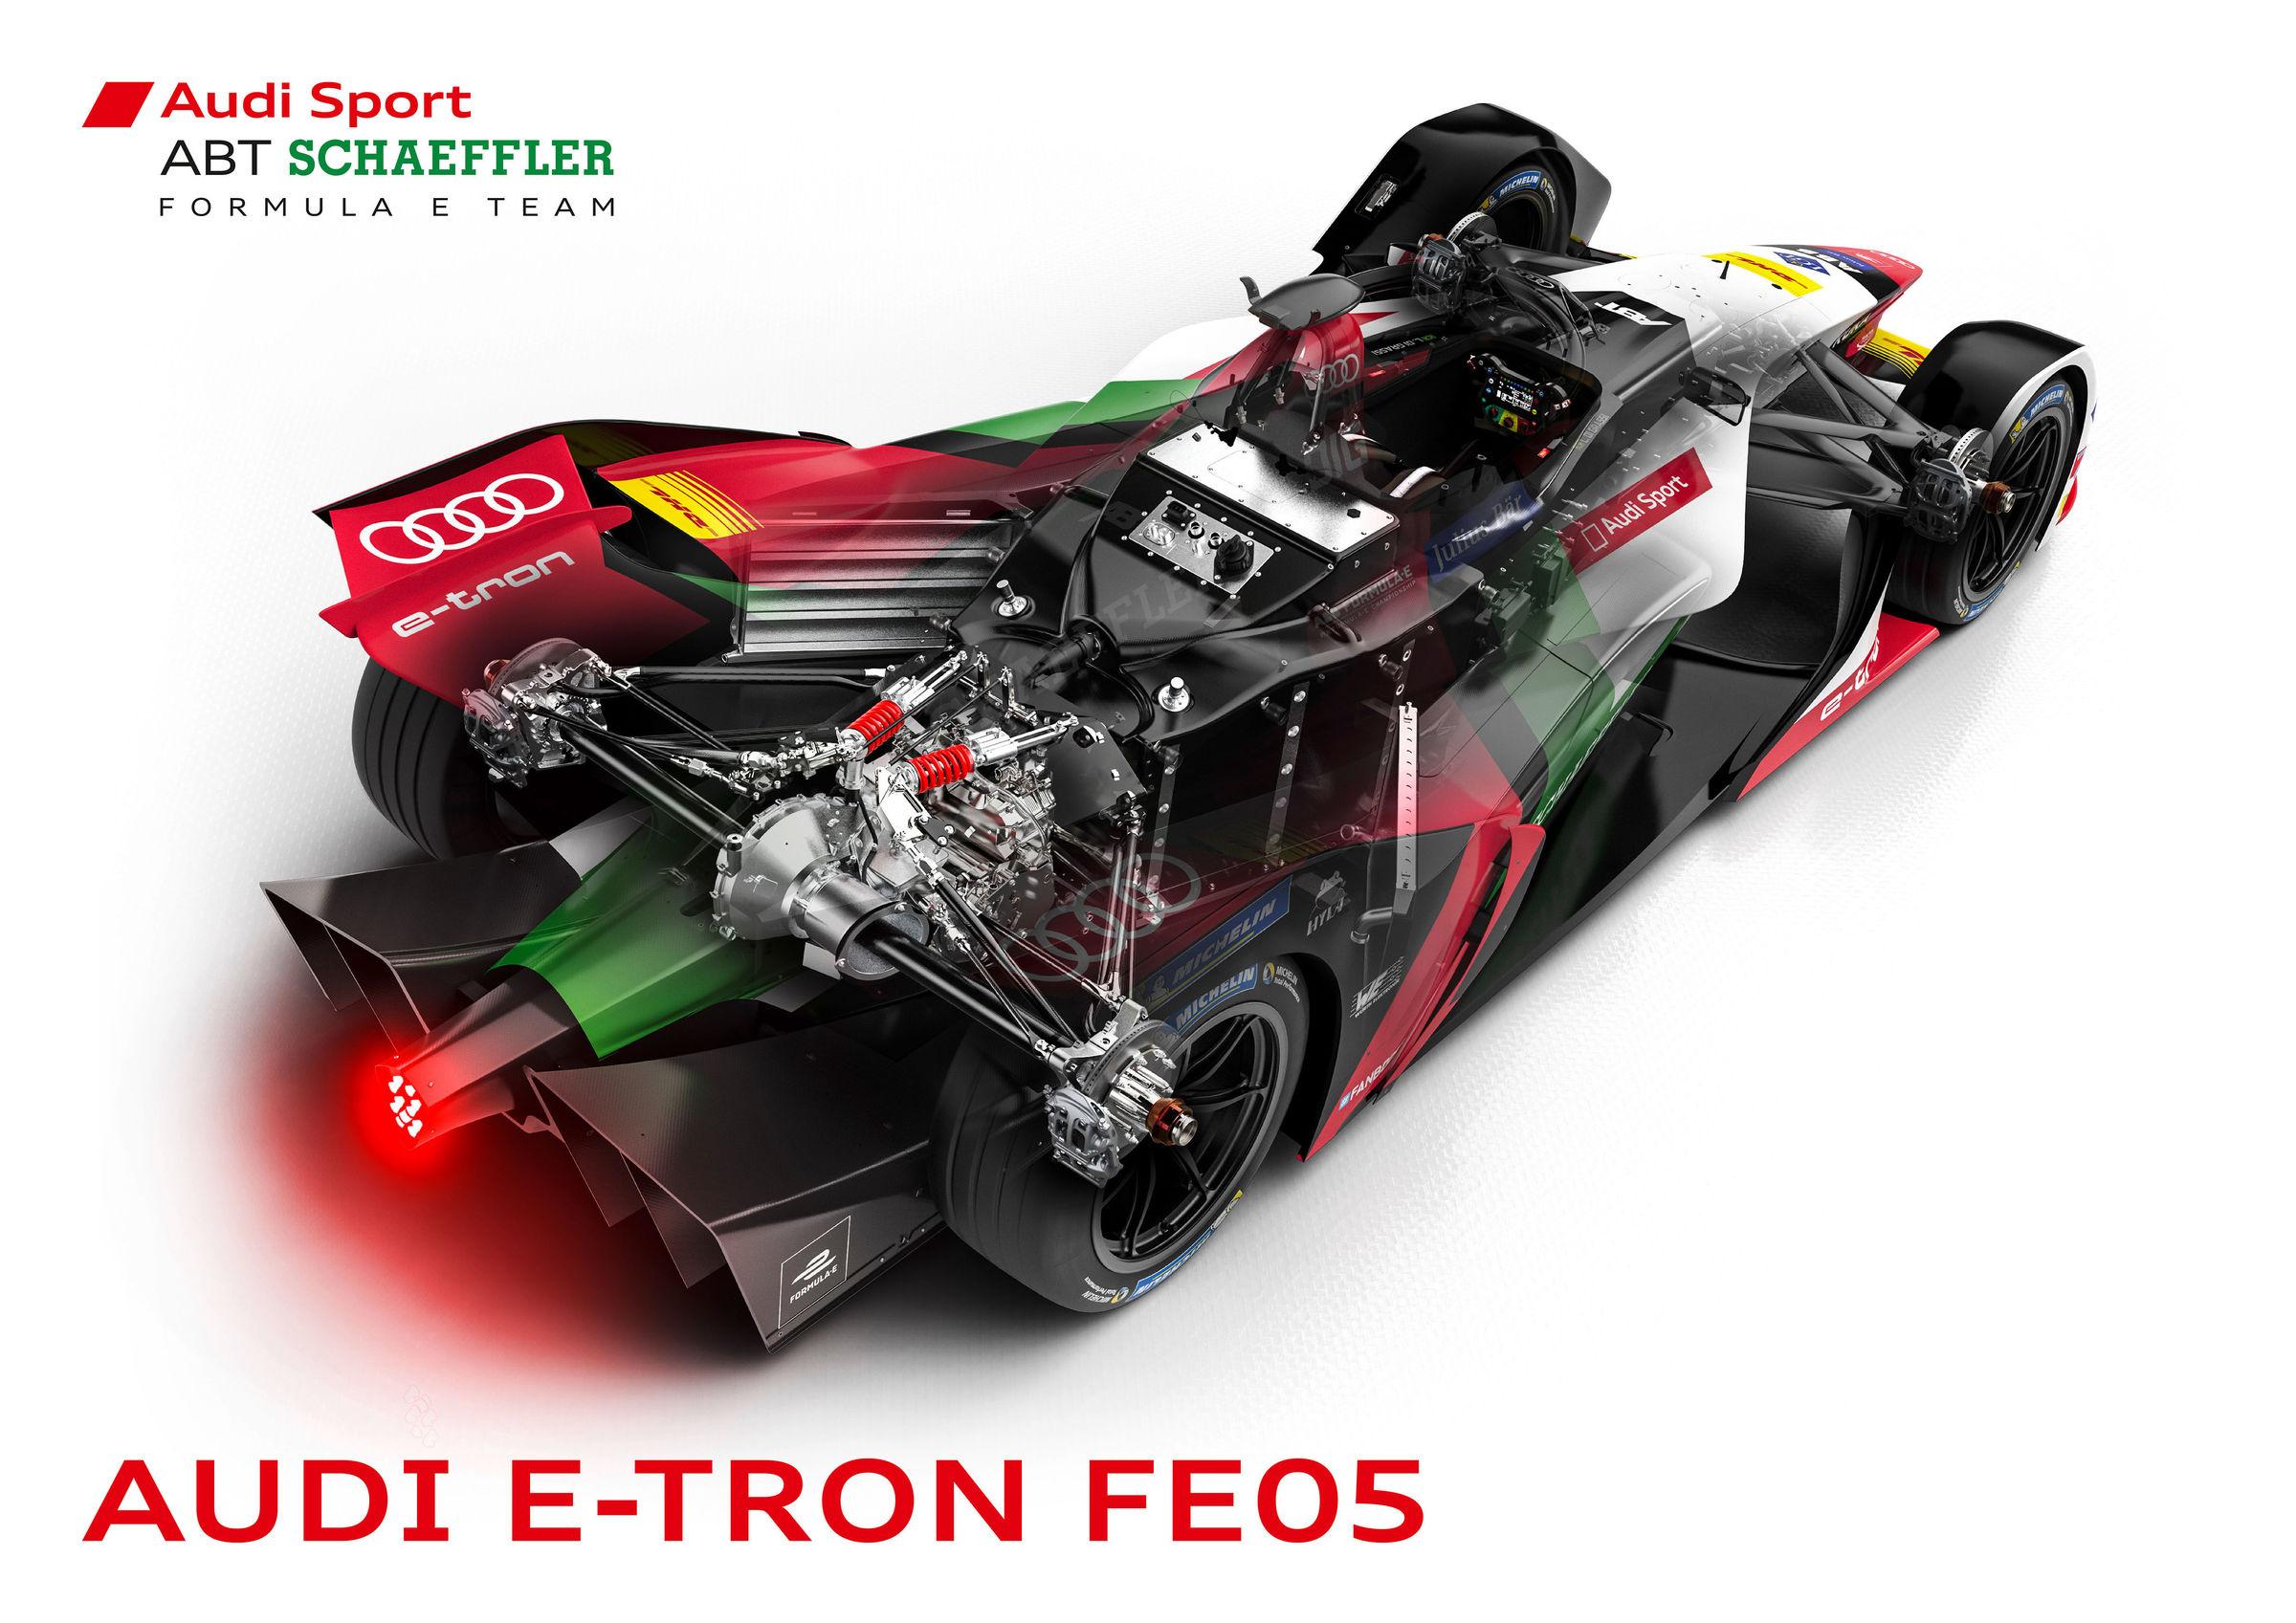 Audi e-tron FE05